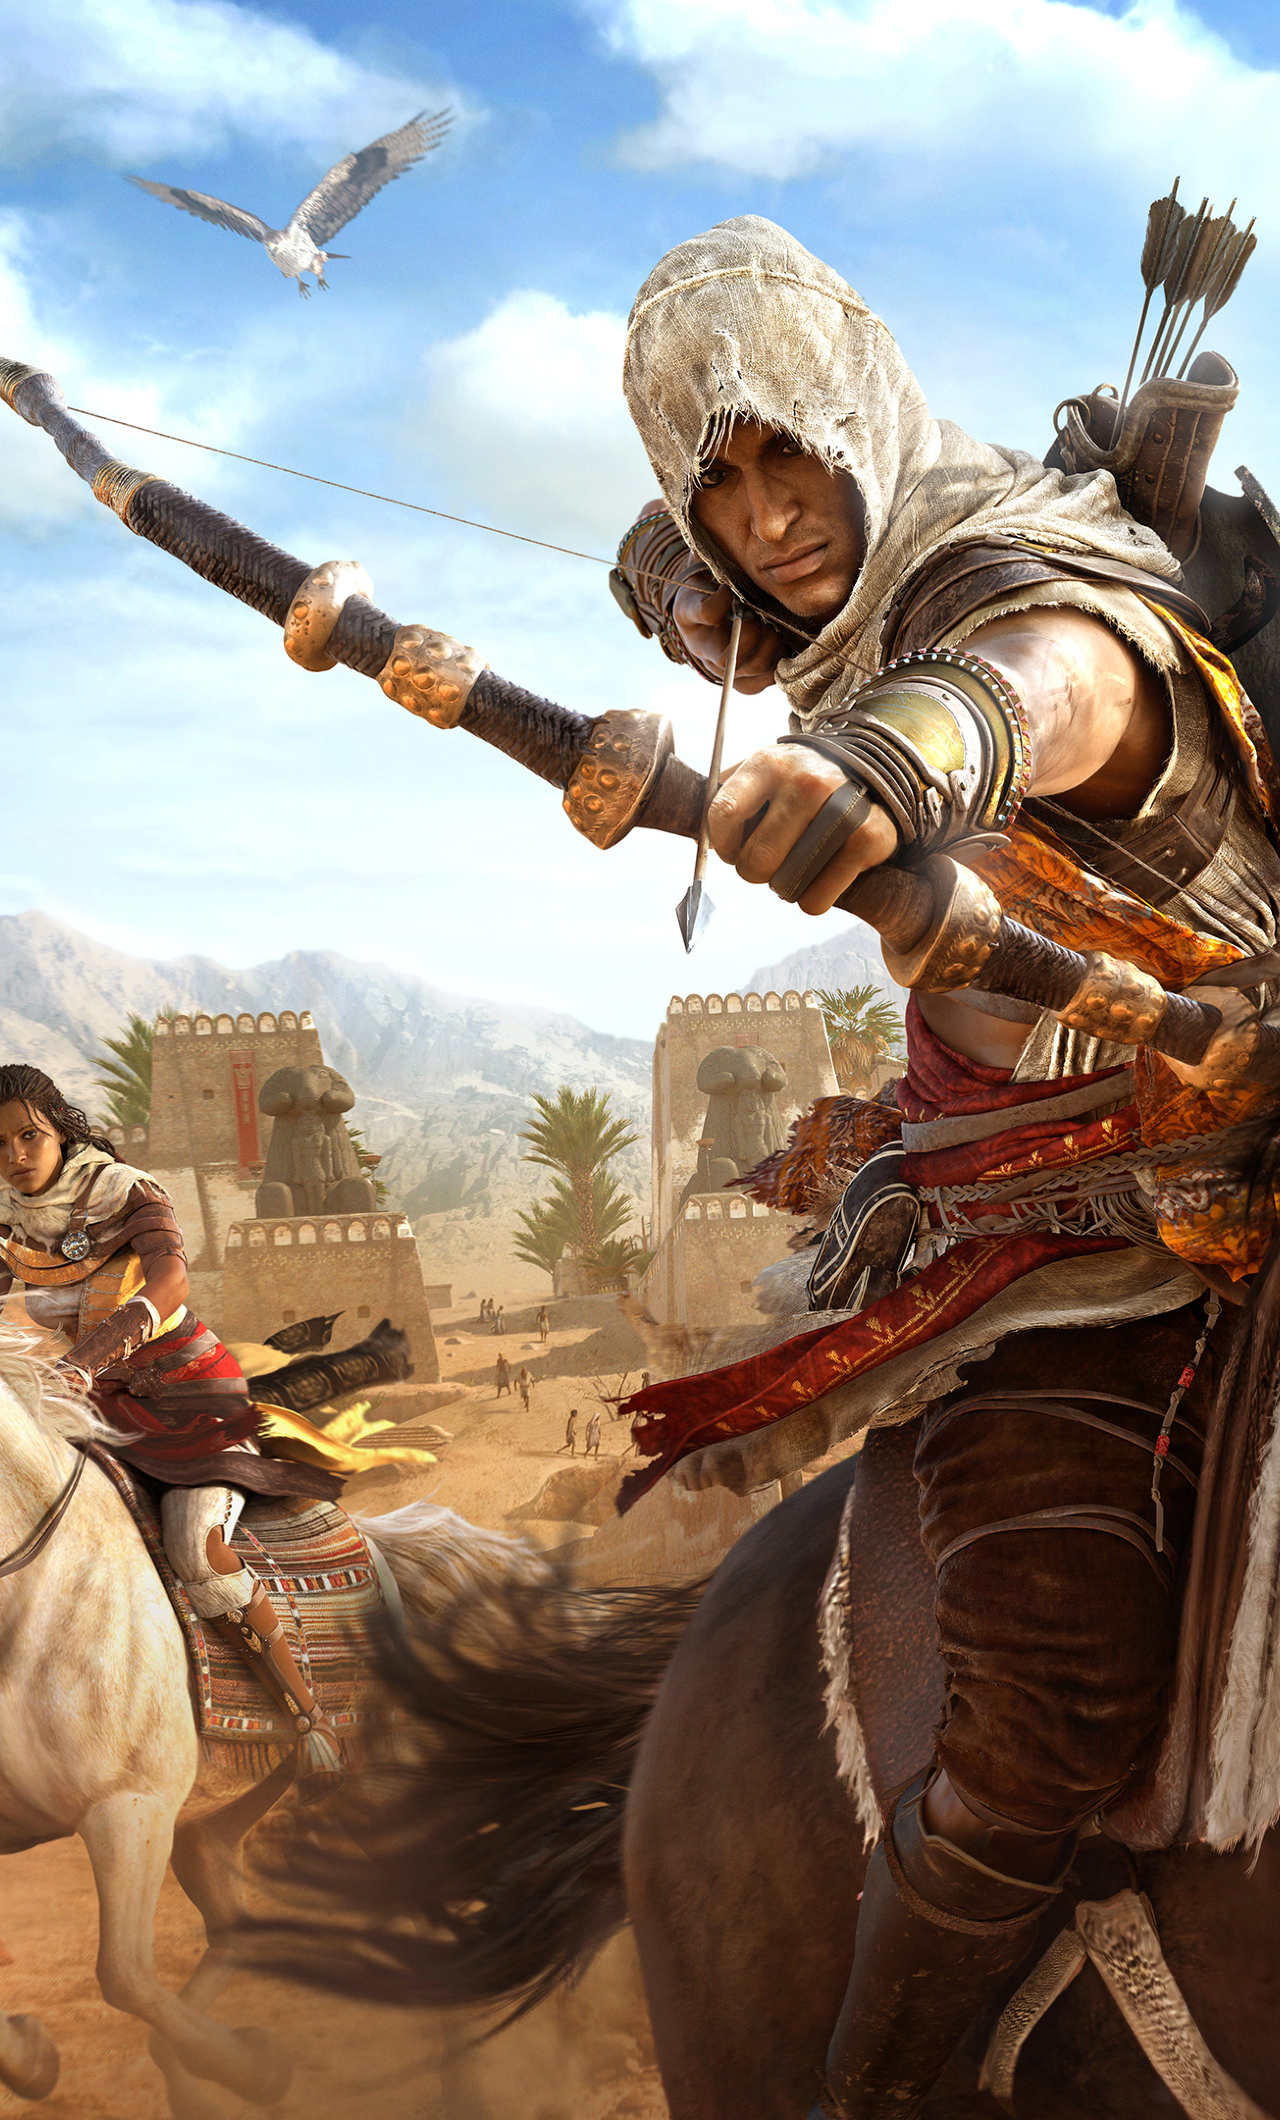 Assassin Creed Origins Wallpaper 4k For Mobile - HD Wallpaper